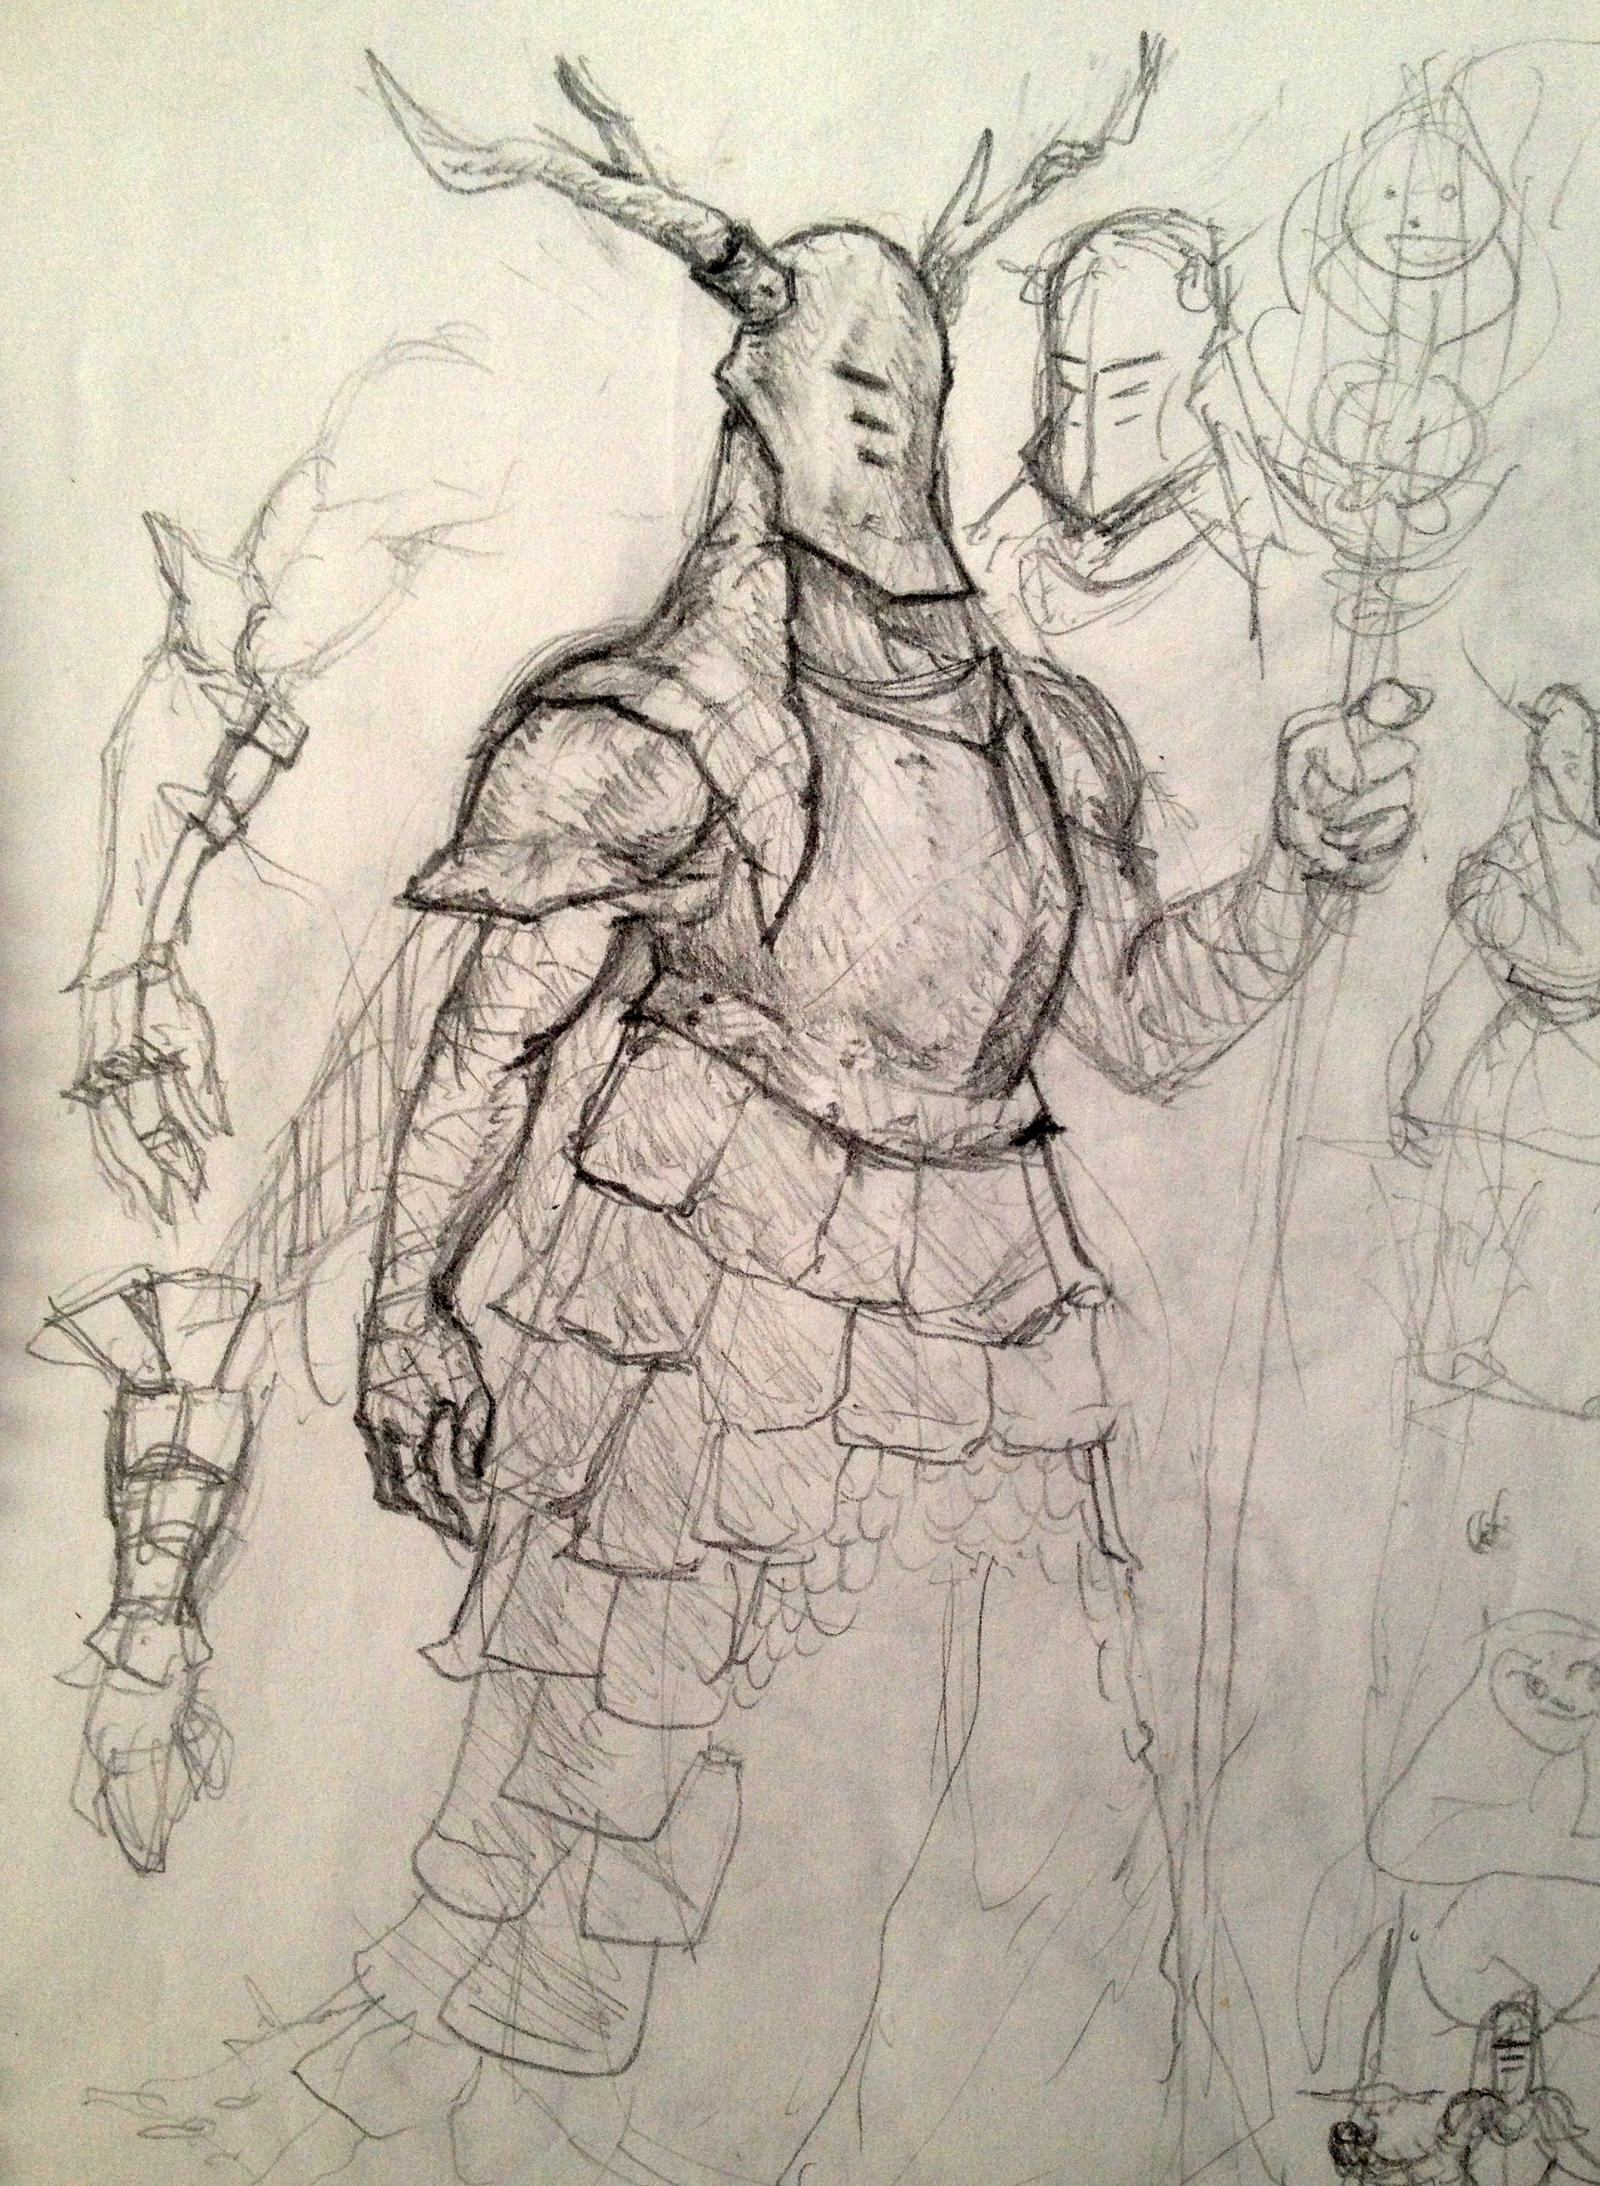 Sketch 1-02 by KidneyShake